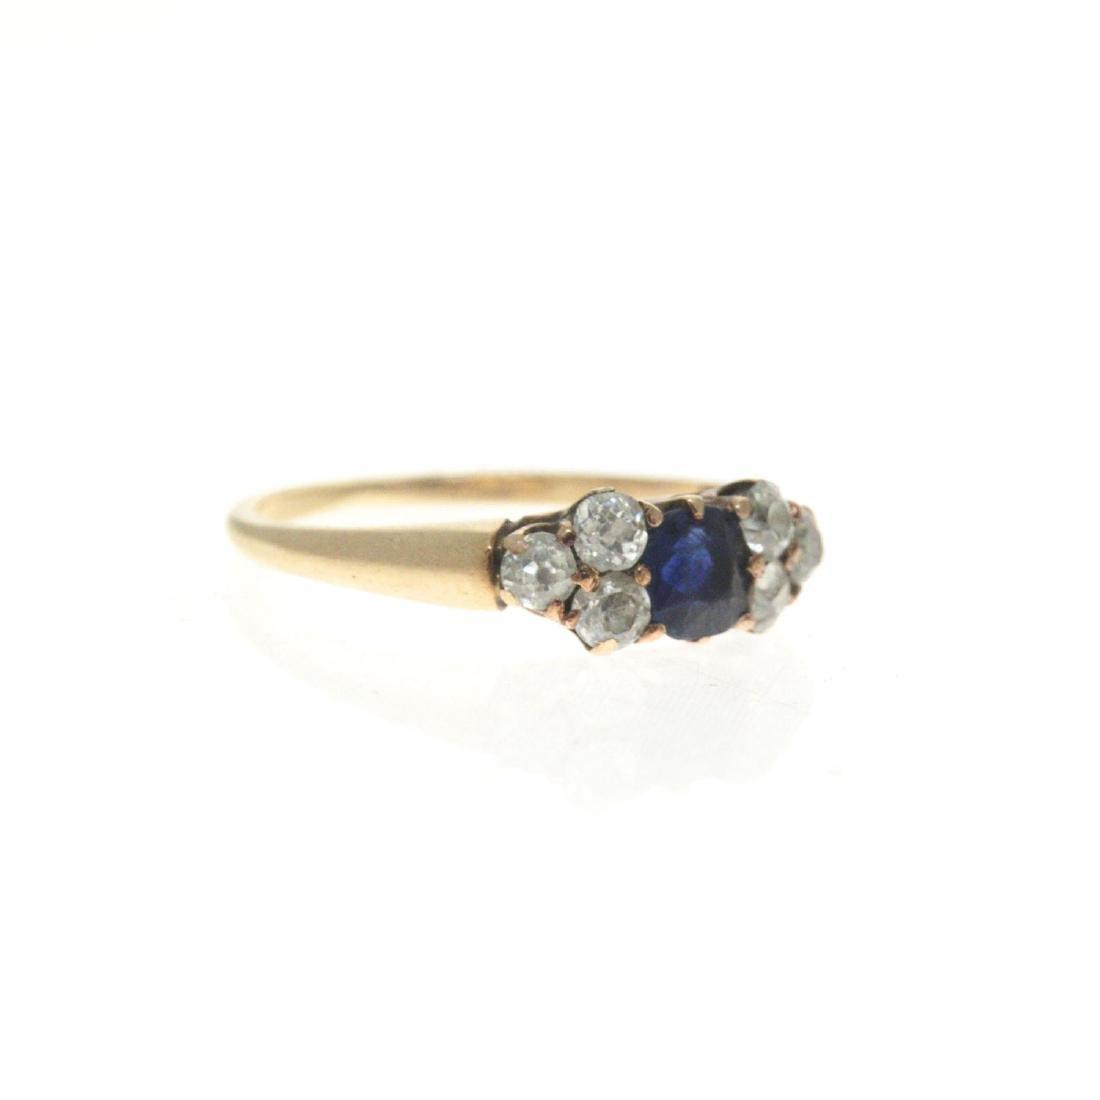 14k Yellow Gold Sapphire Diamond Ring. - 5